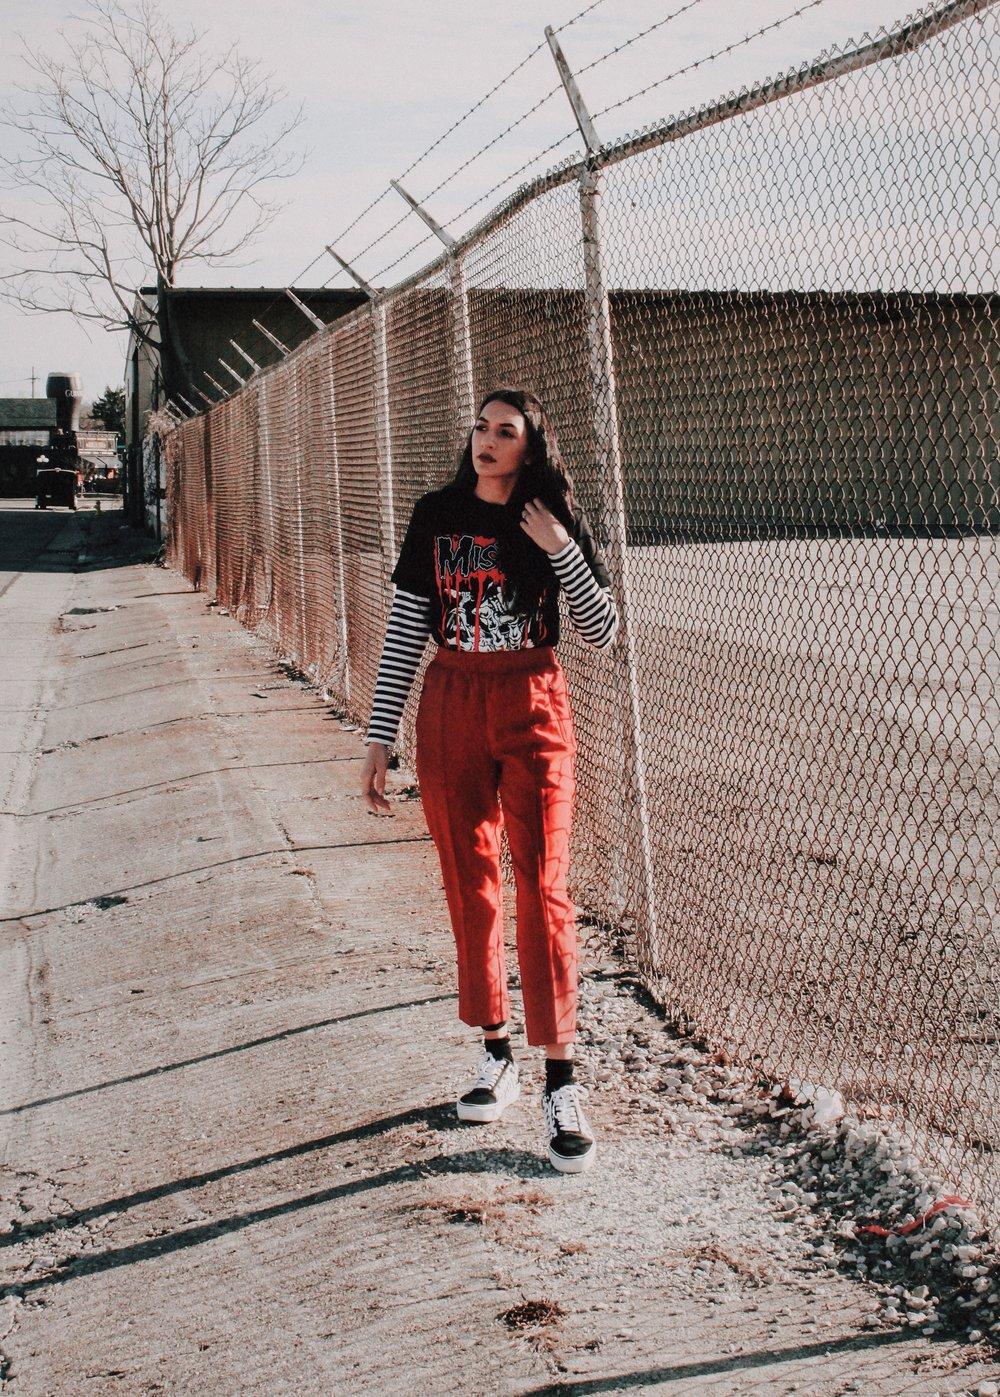 Misfit_Grunge_outfit_Aniyahlationn03